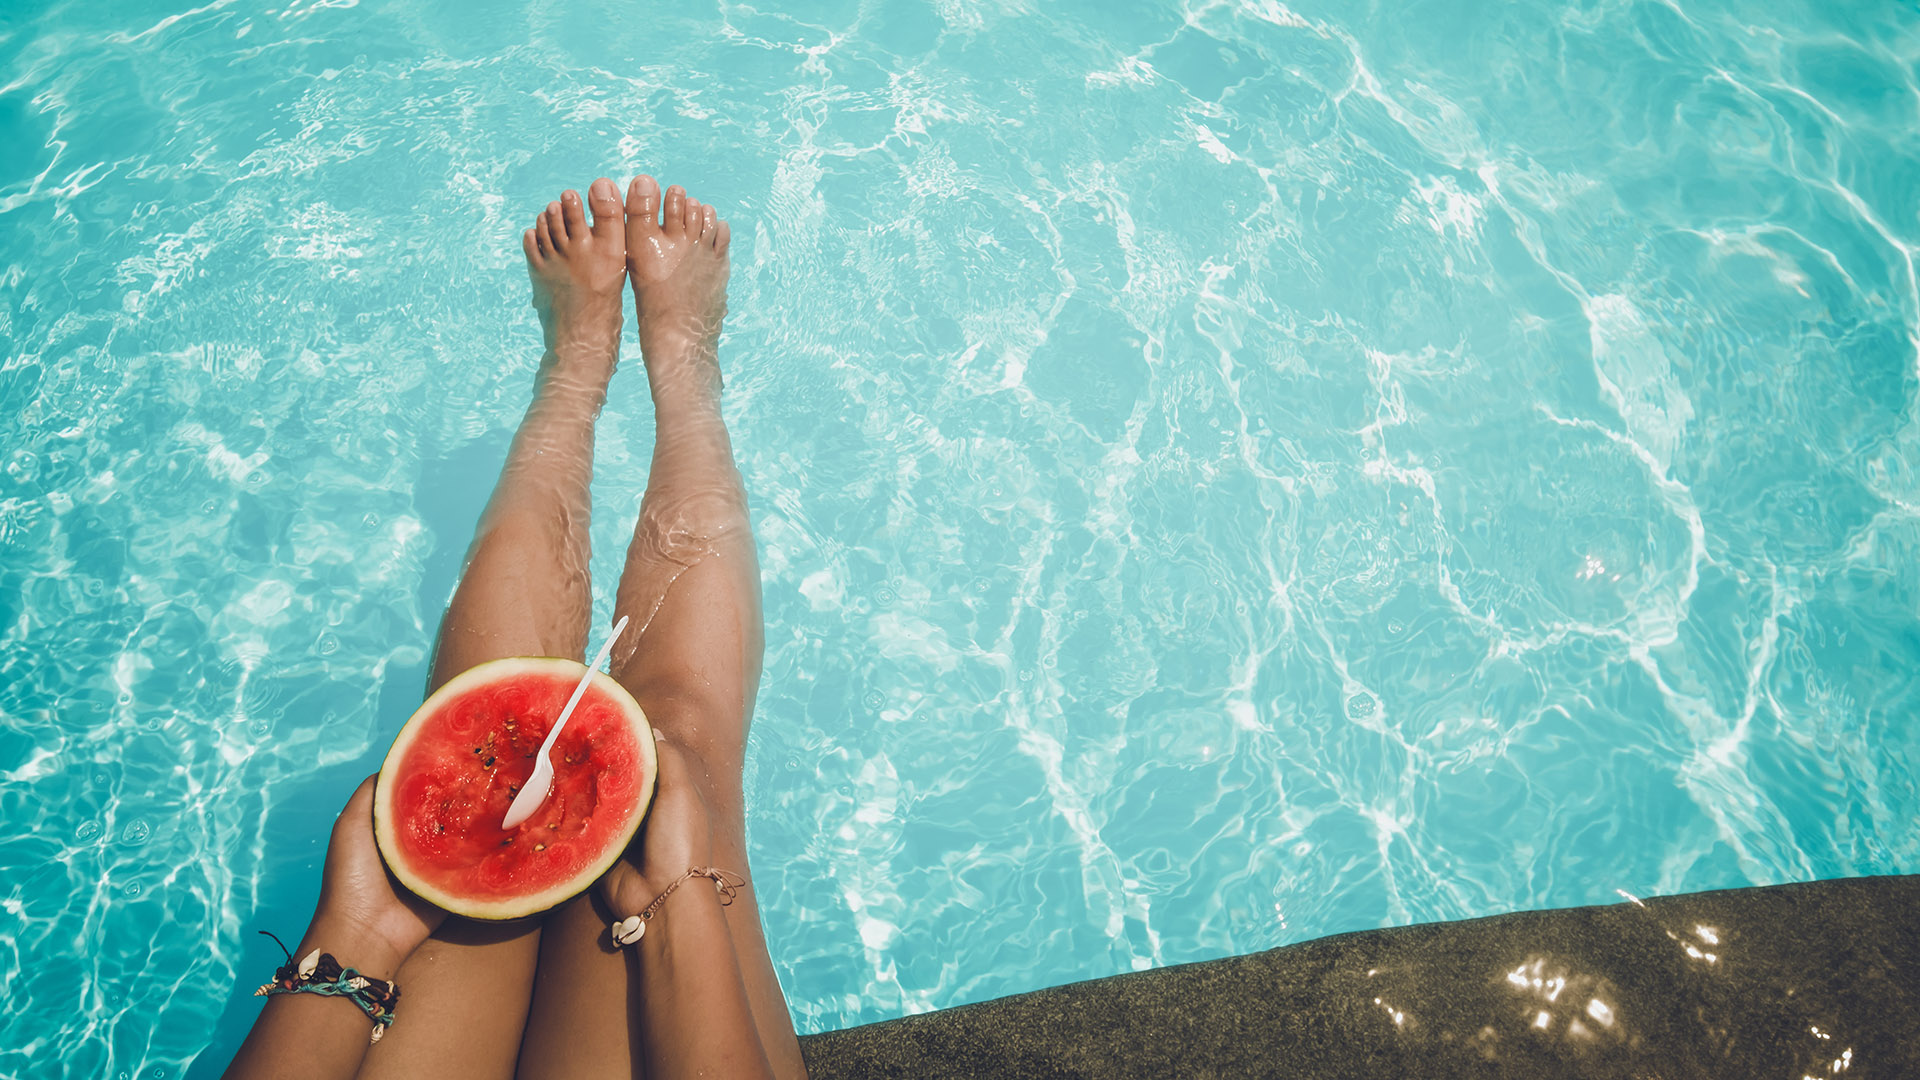 Las frutas son infaltables en la vianda de la playa o la pileta (Getty)